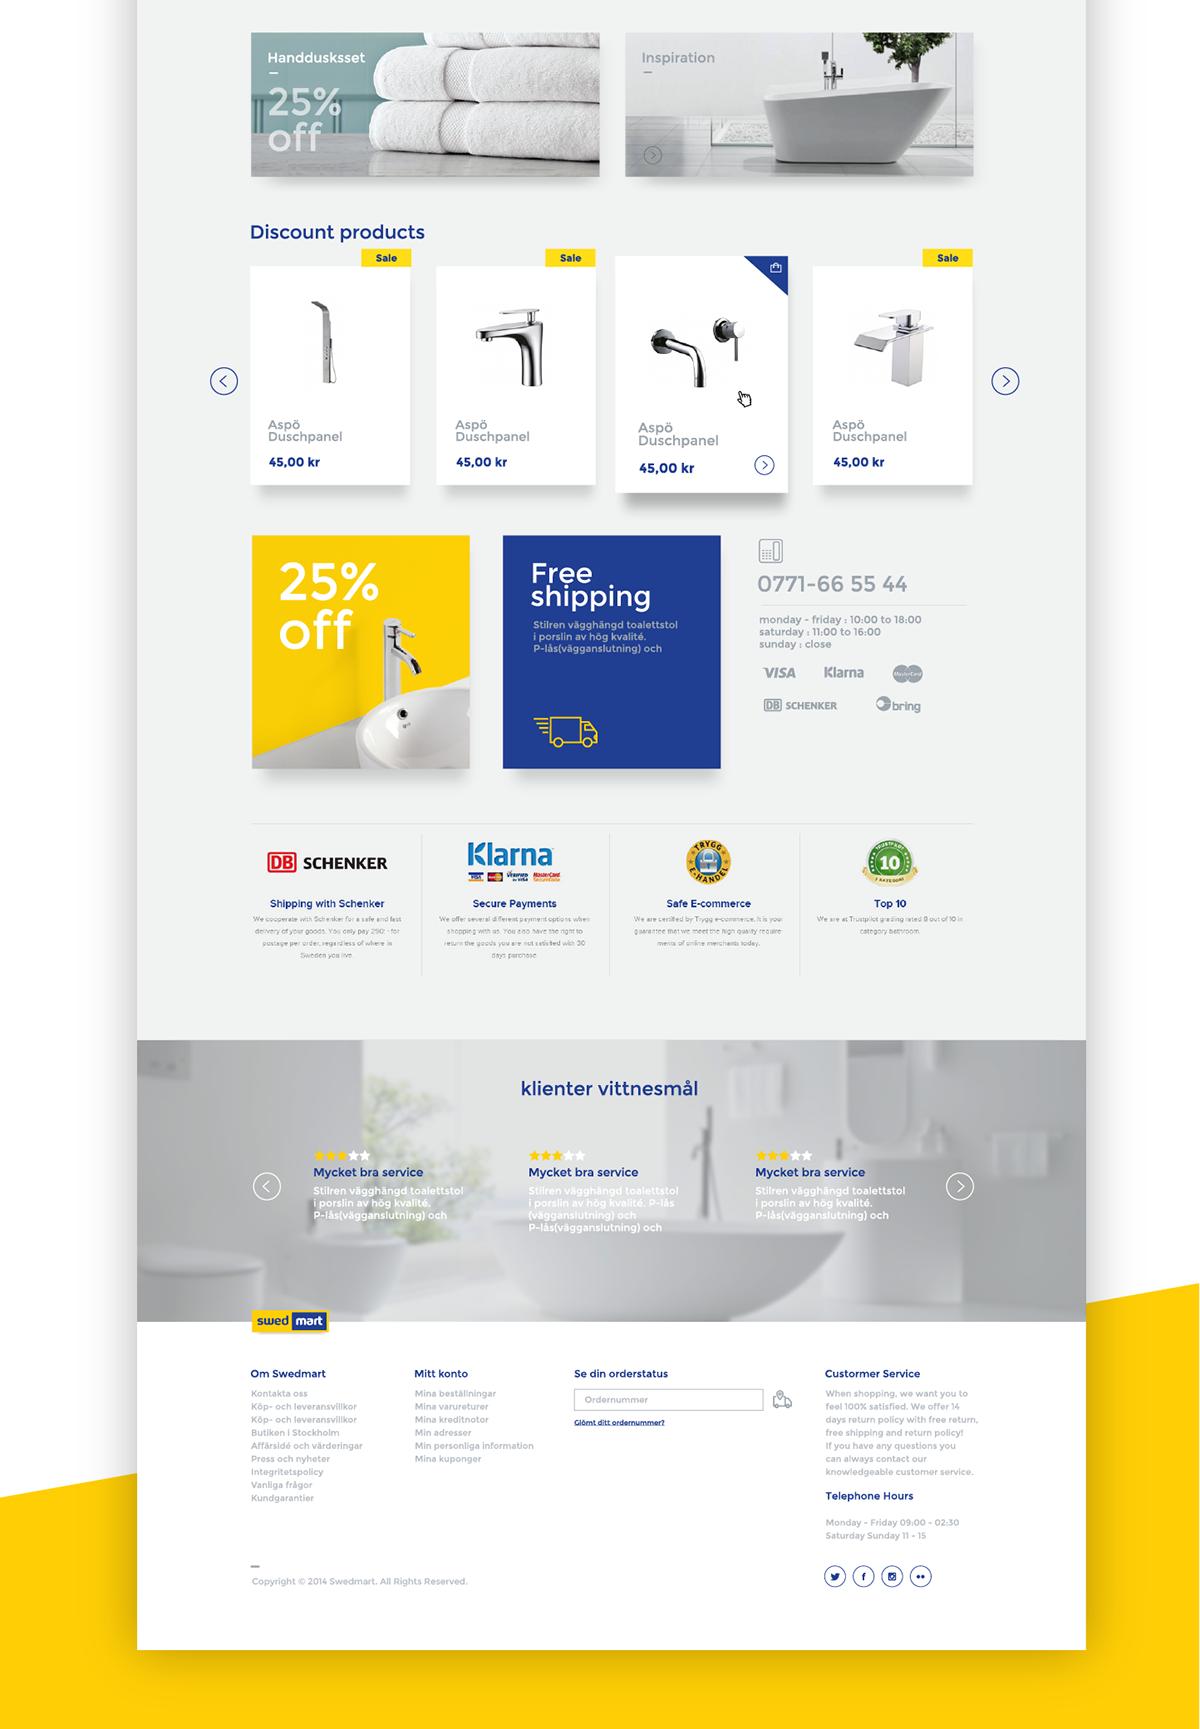 Swedmart website UI redesign on Behance Design